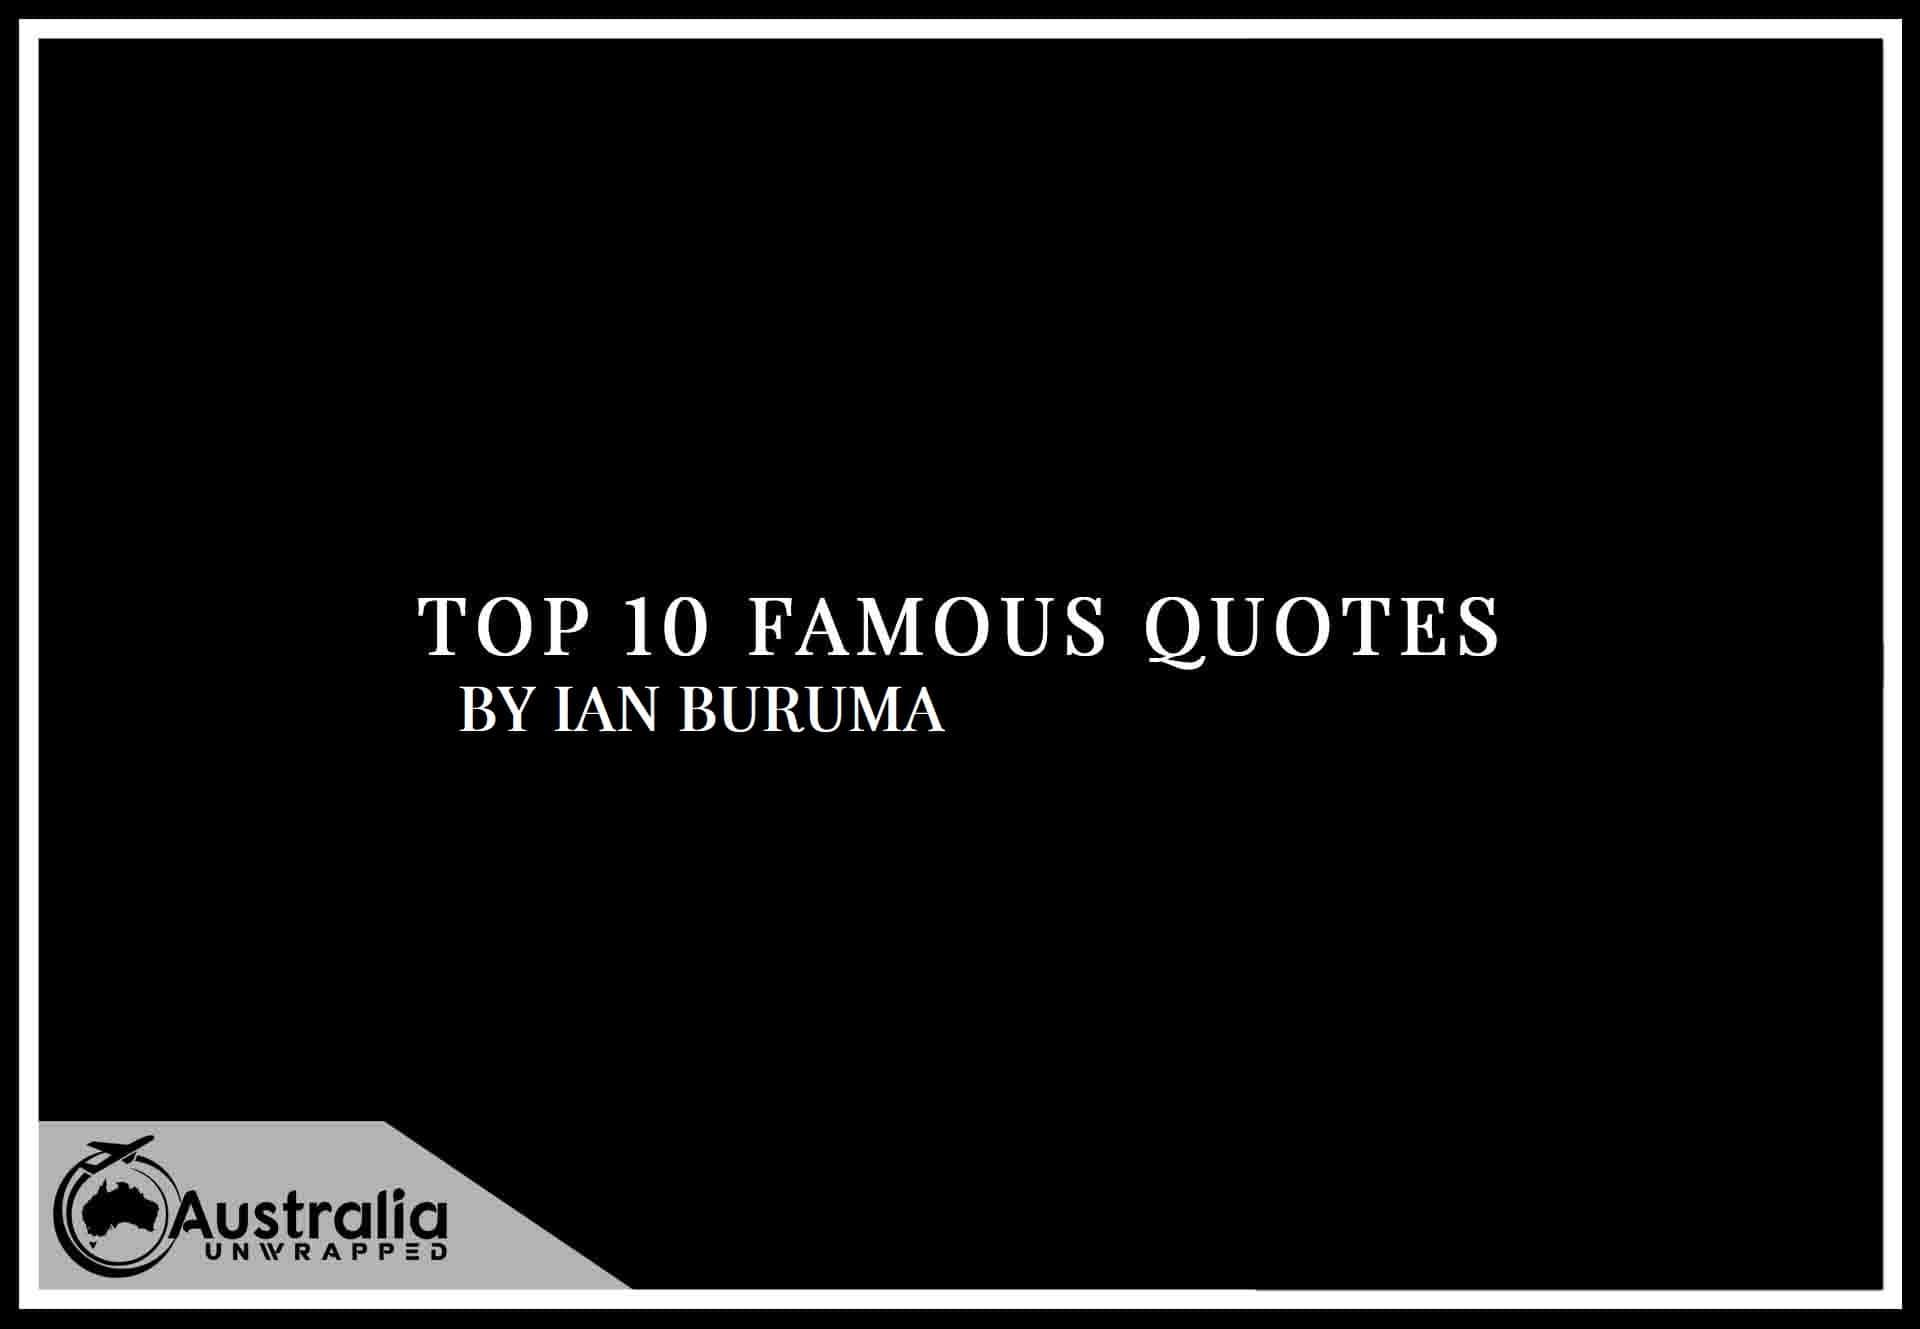 Top 10 Famous Quotes by Author Ian Buruma